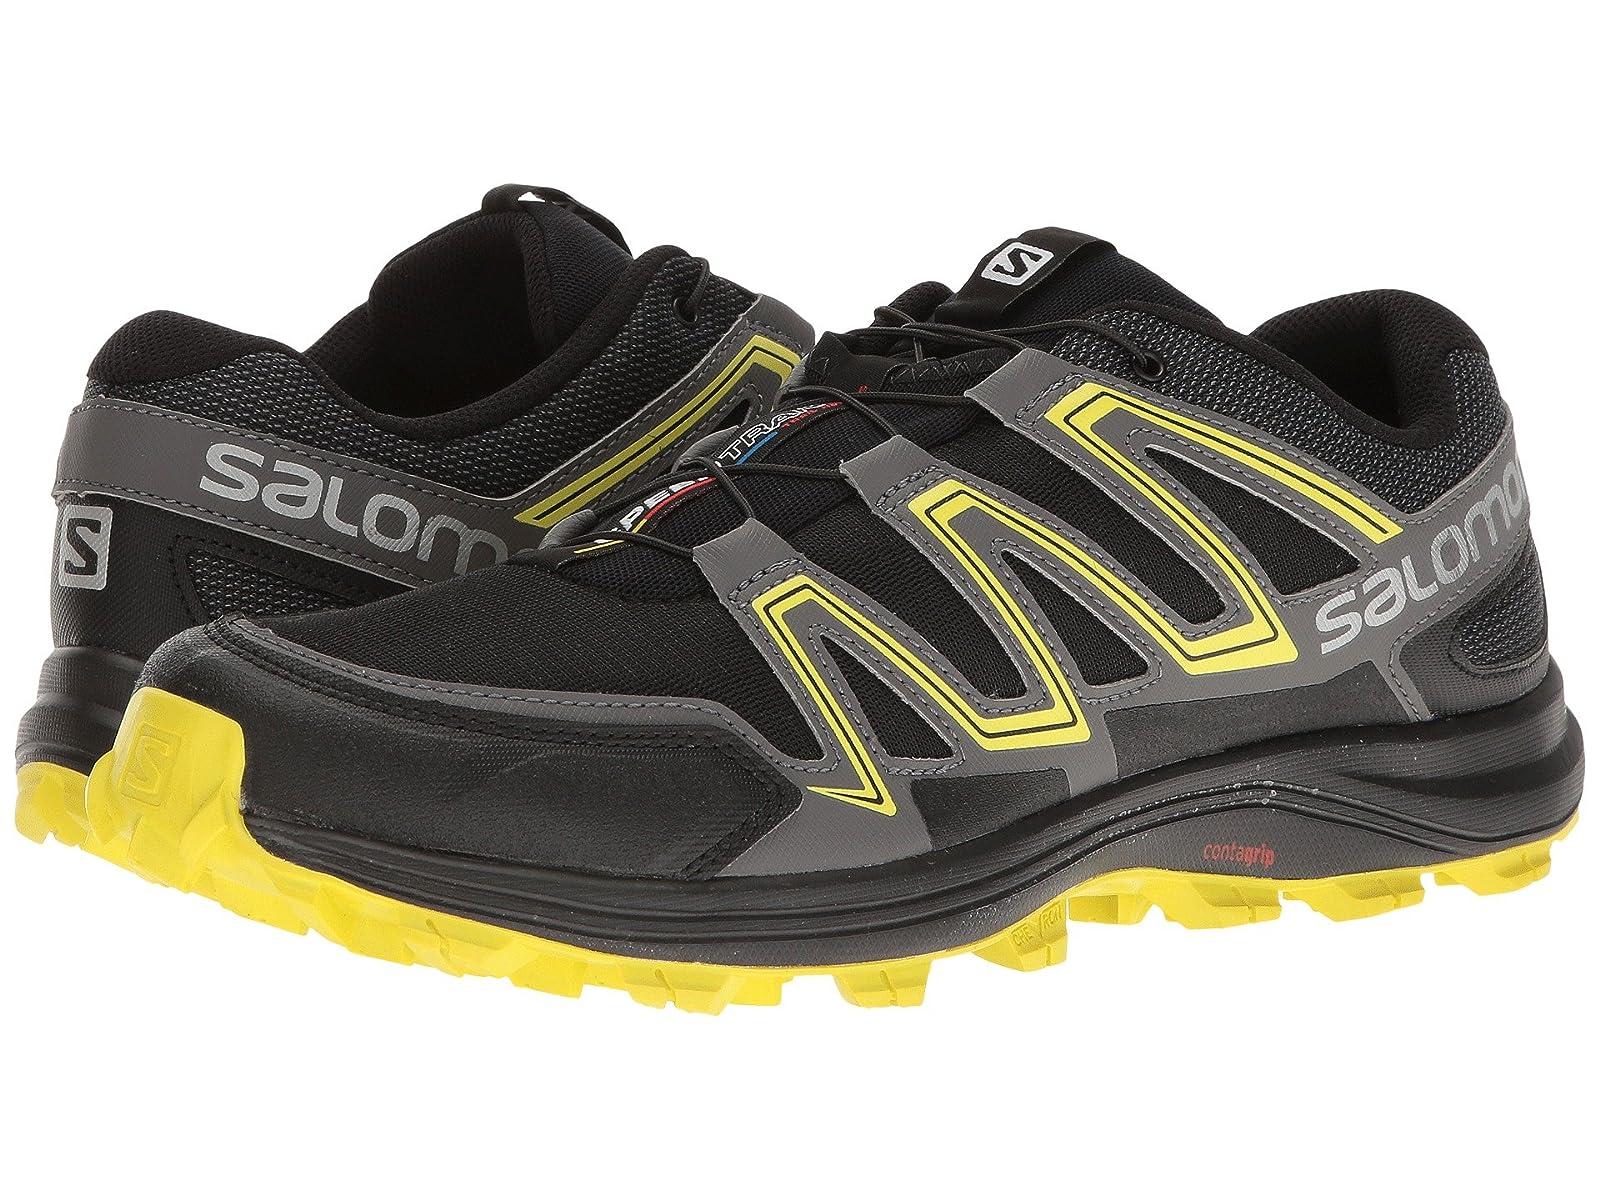 Salomon SpeedtrakAtmospheric grades have affordable shoes